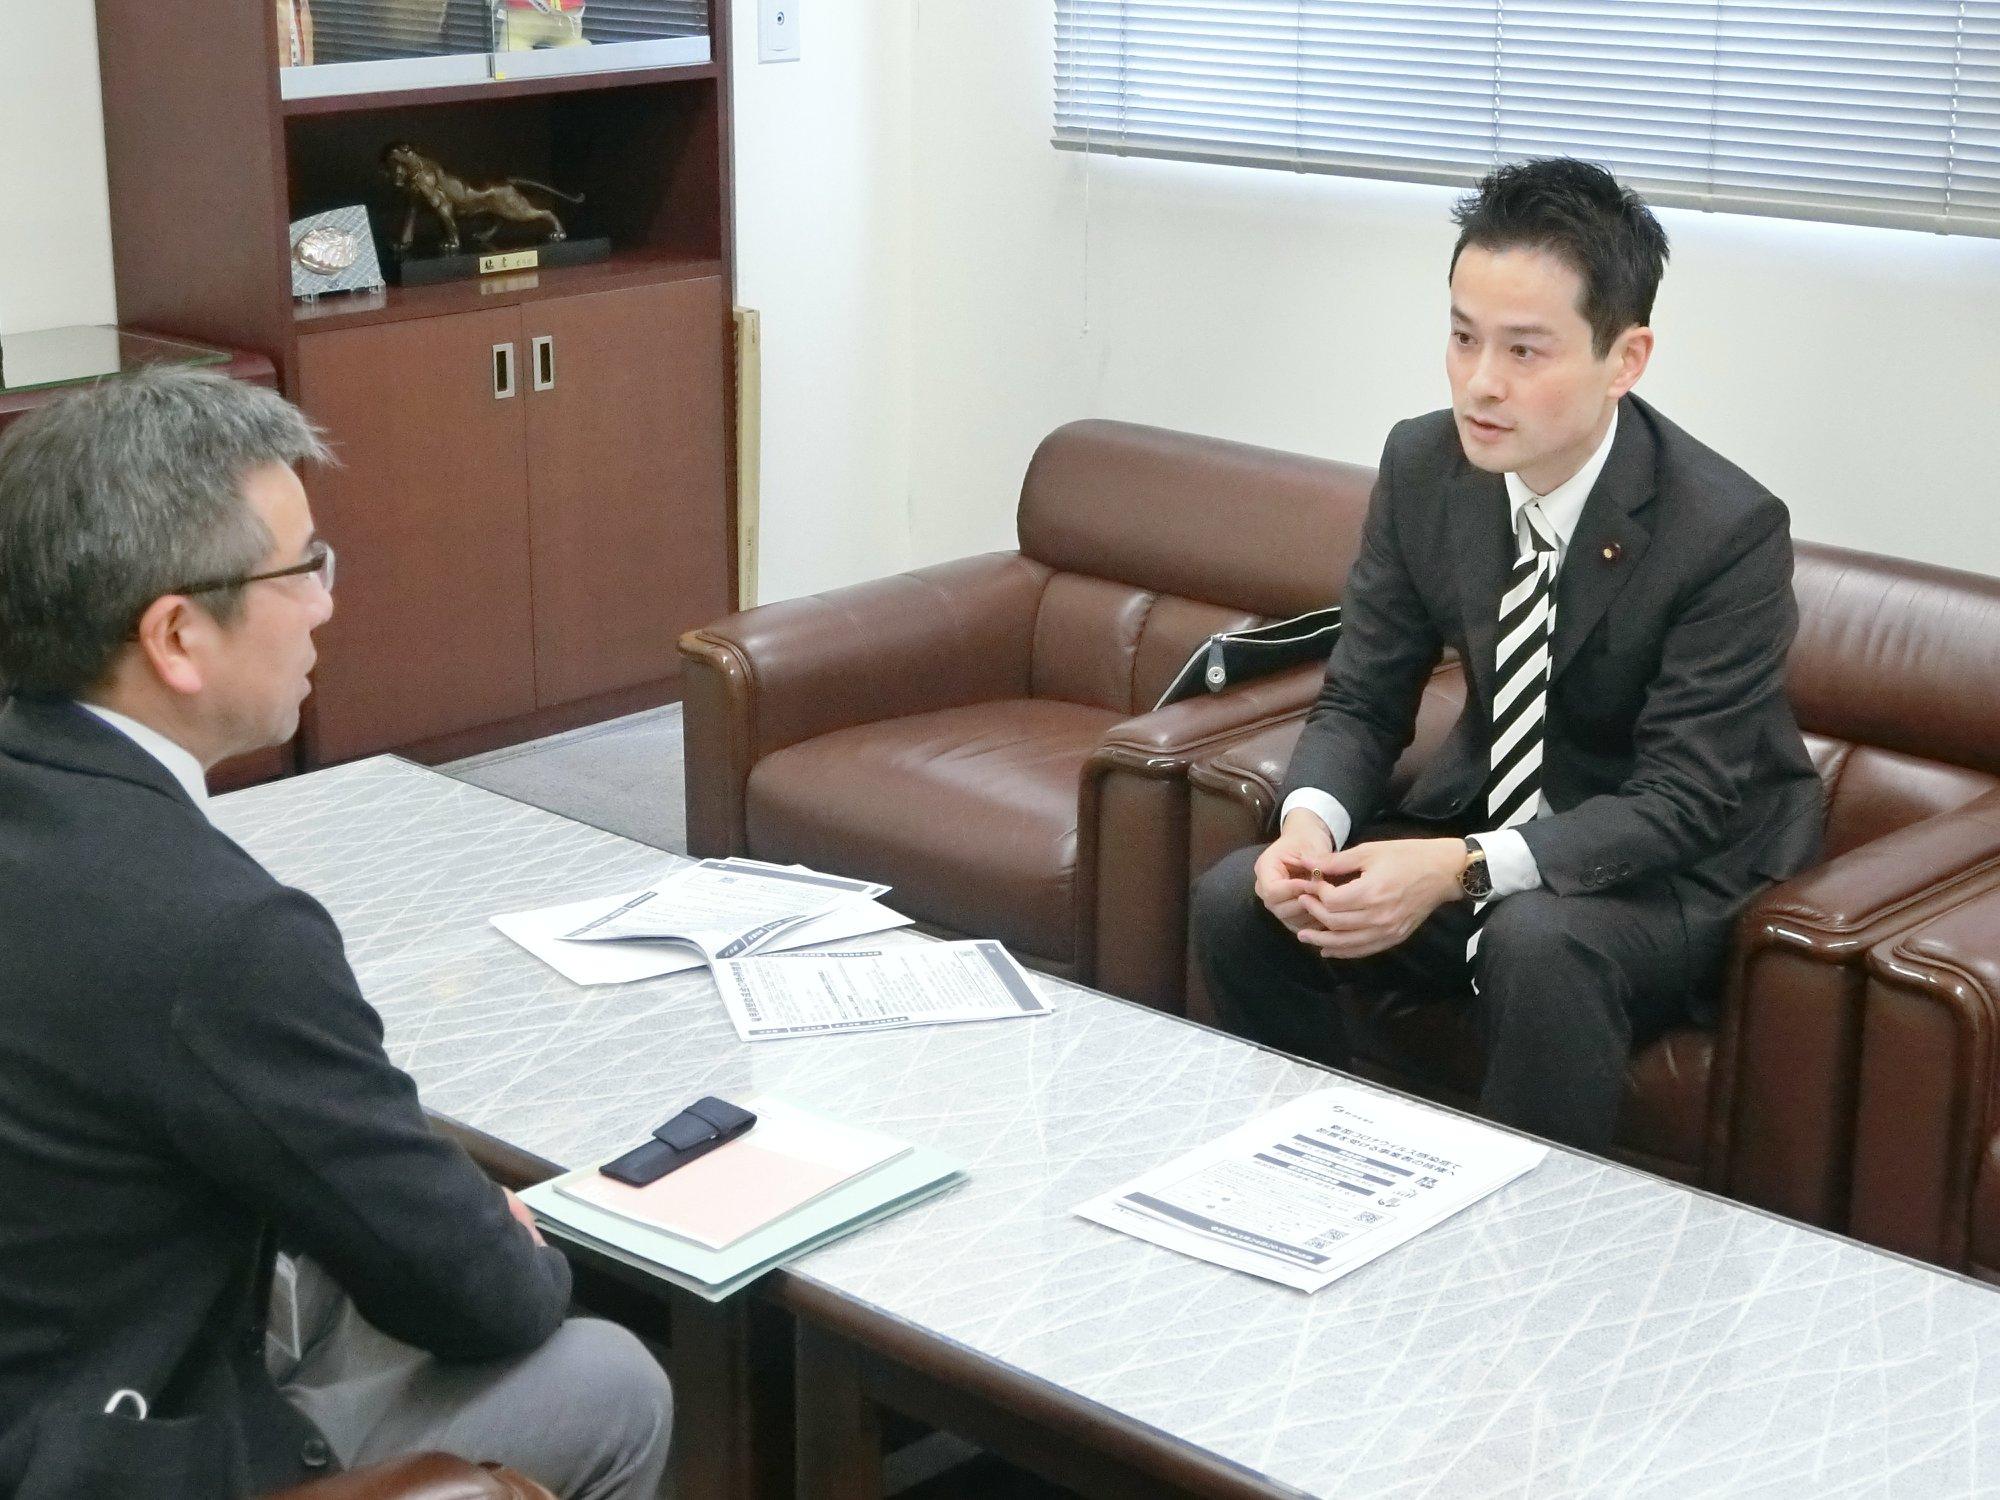 丹南・福井市の企業を訪問